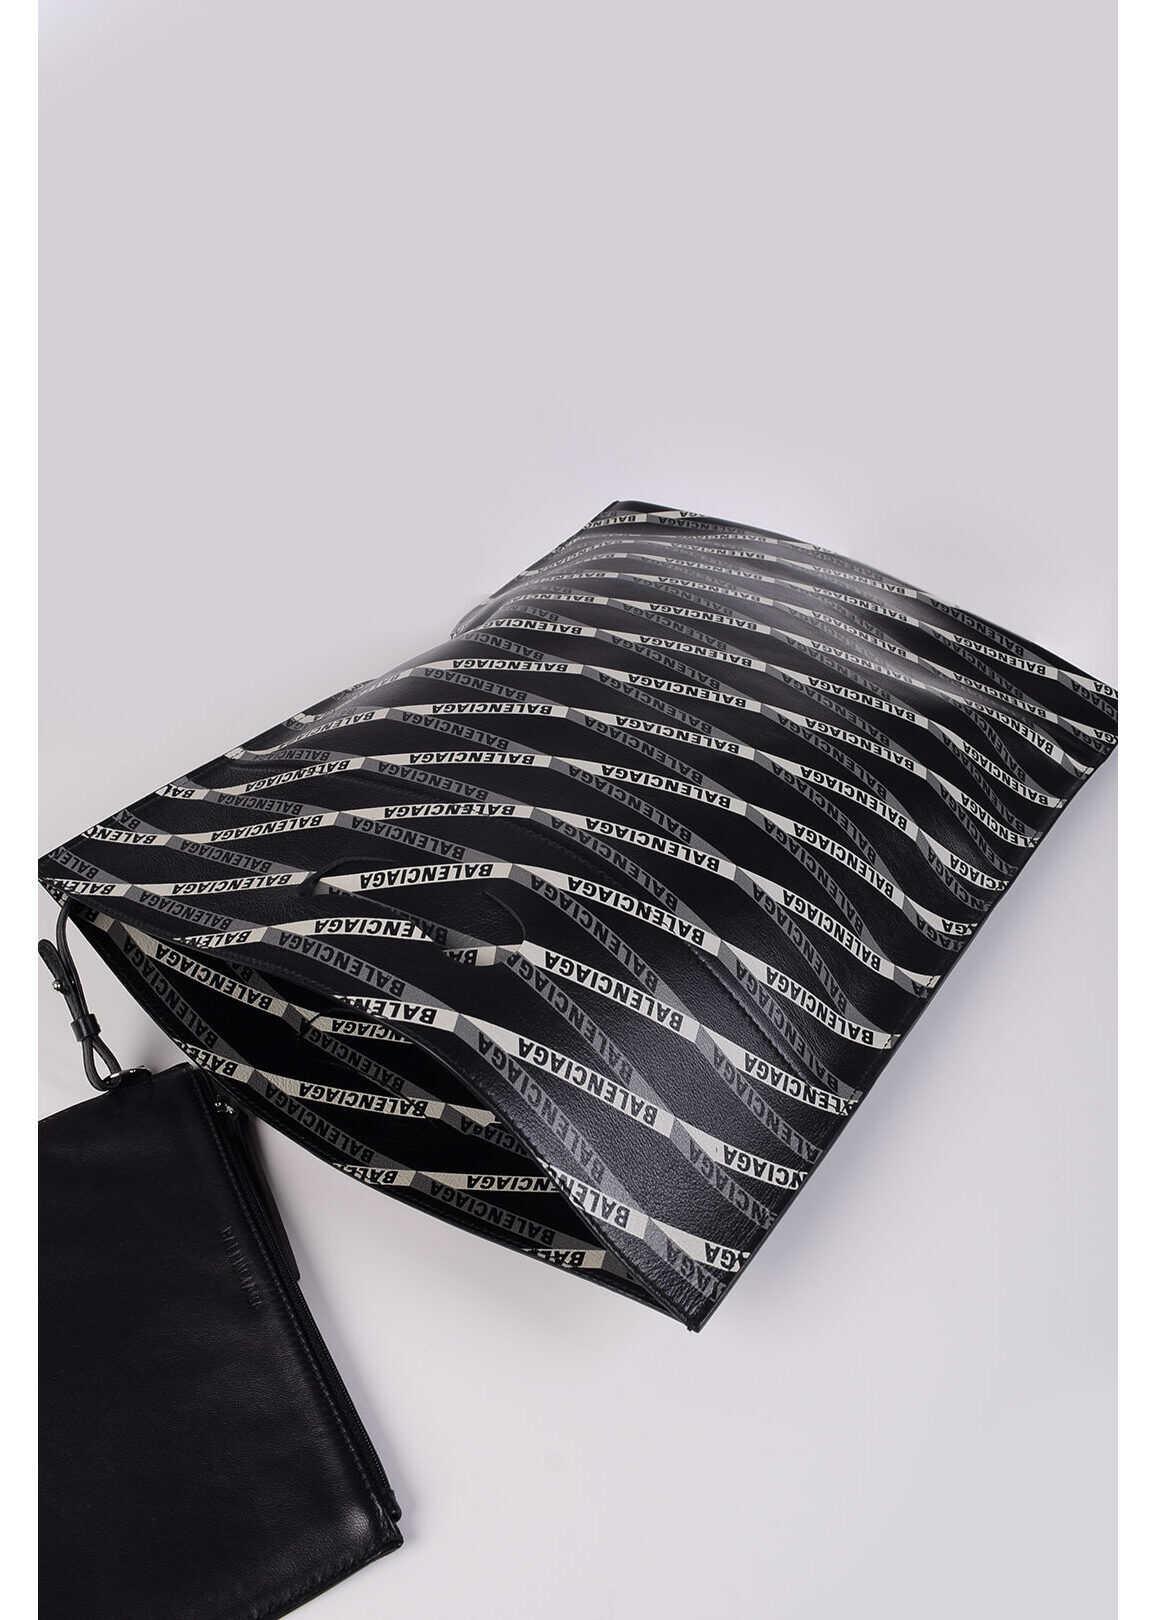 Balenciaga Monogram Leather SUPERMARKET Tote Bag BLACK